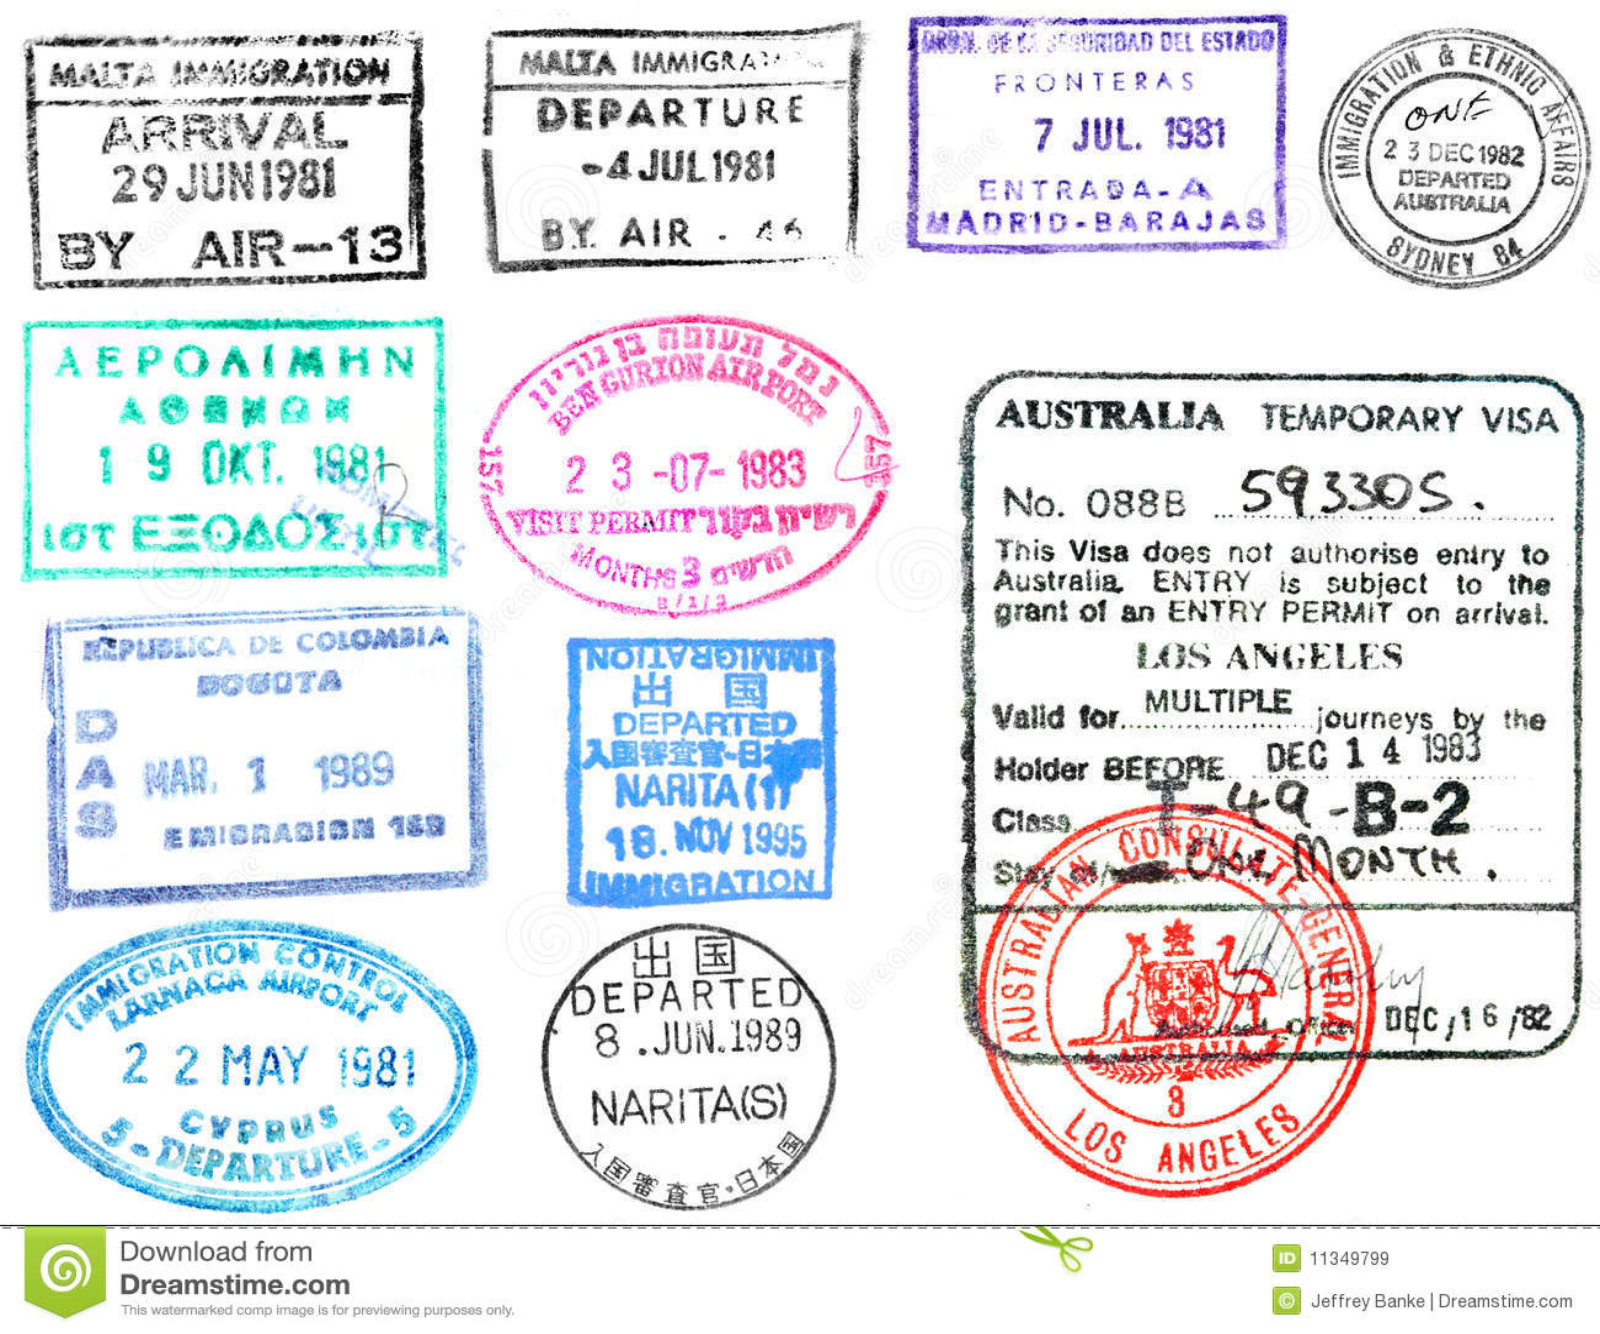 Passport stamps and visa s